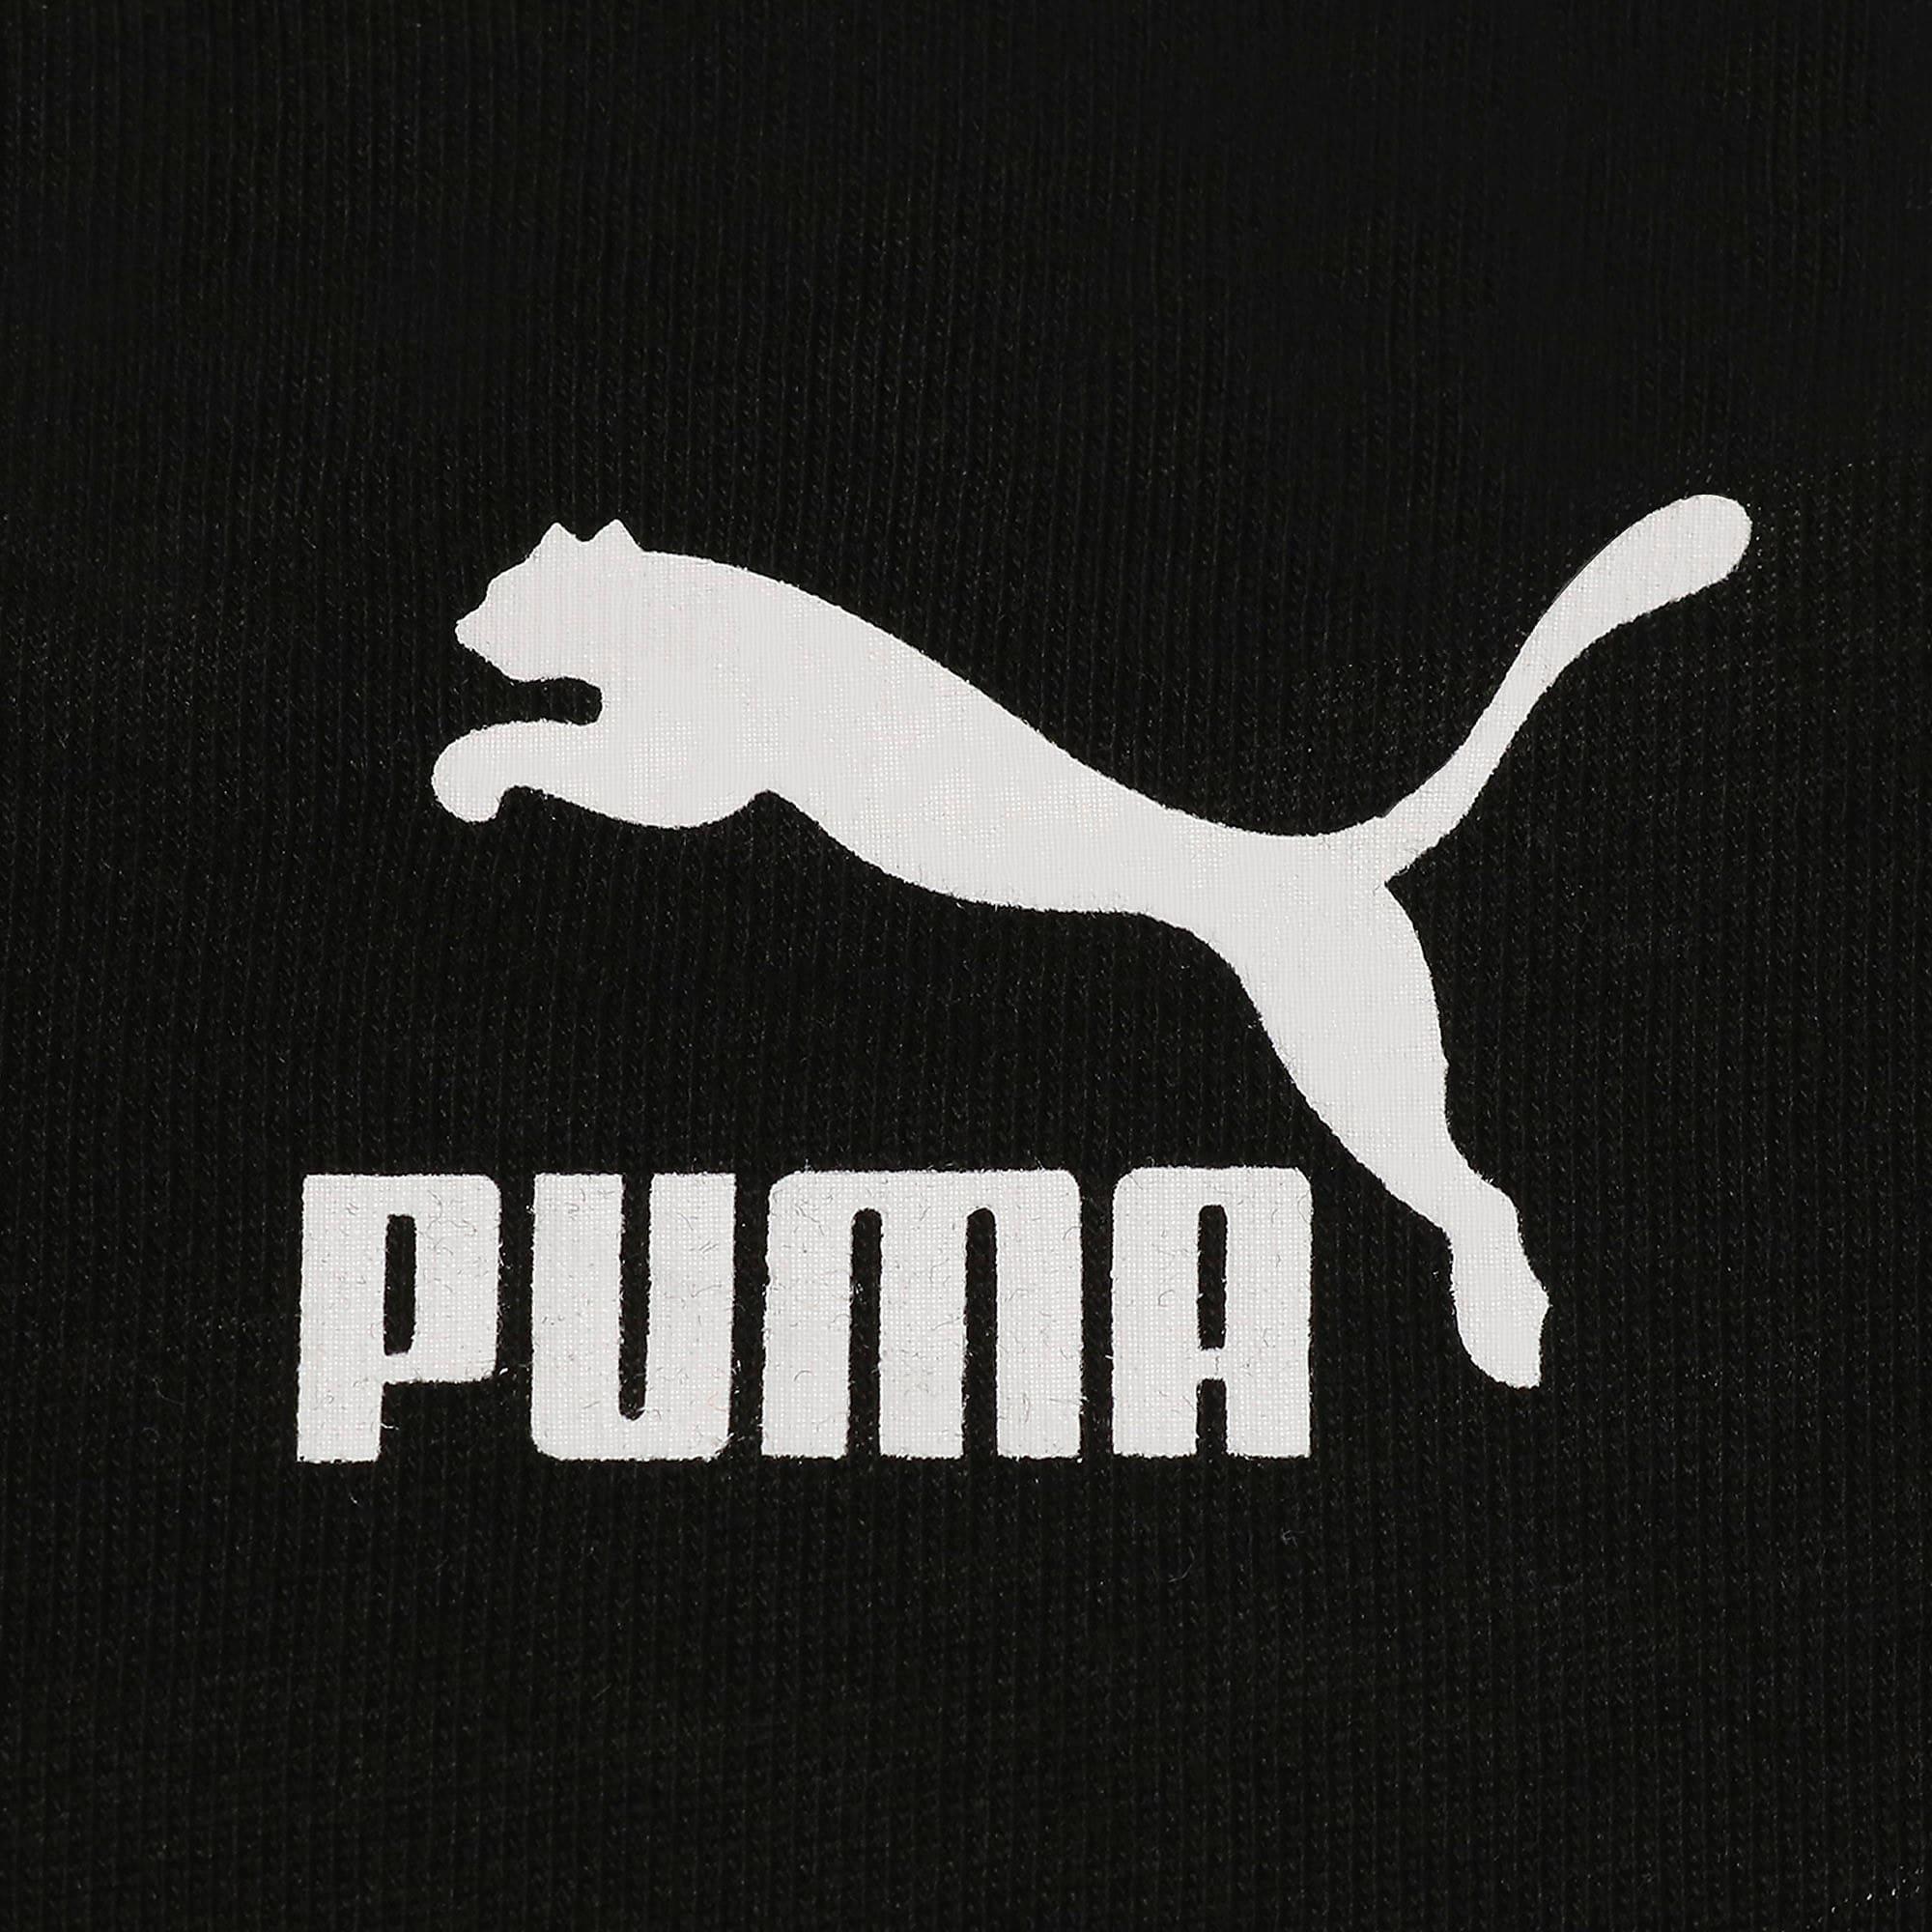 Thumbnail 6 of PUMA XTG グラフィック ウィメンズ SS Tシャツ 半袖, Cotton Black, medium-JPN